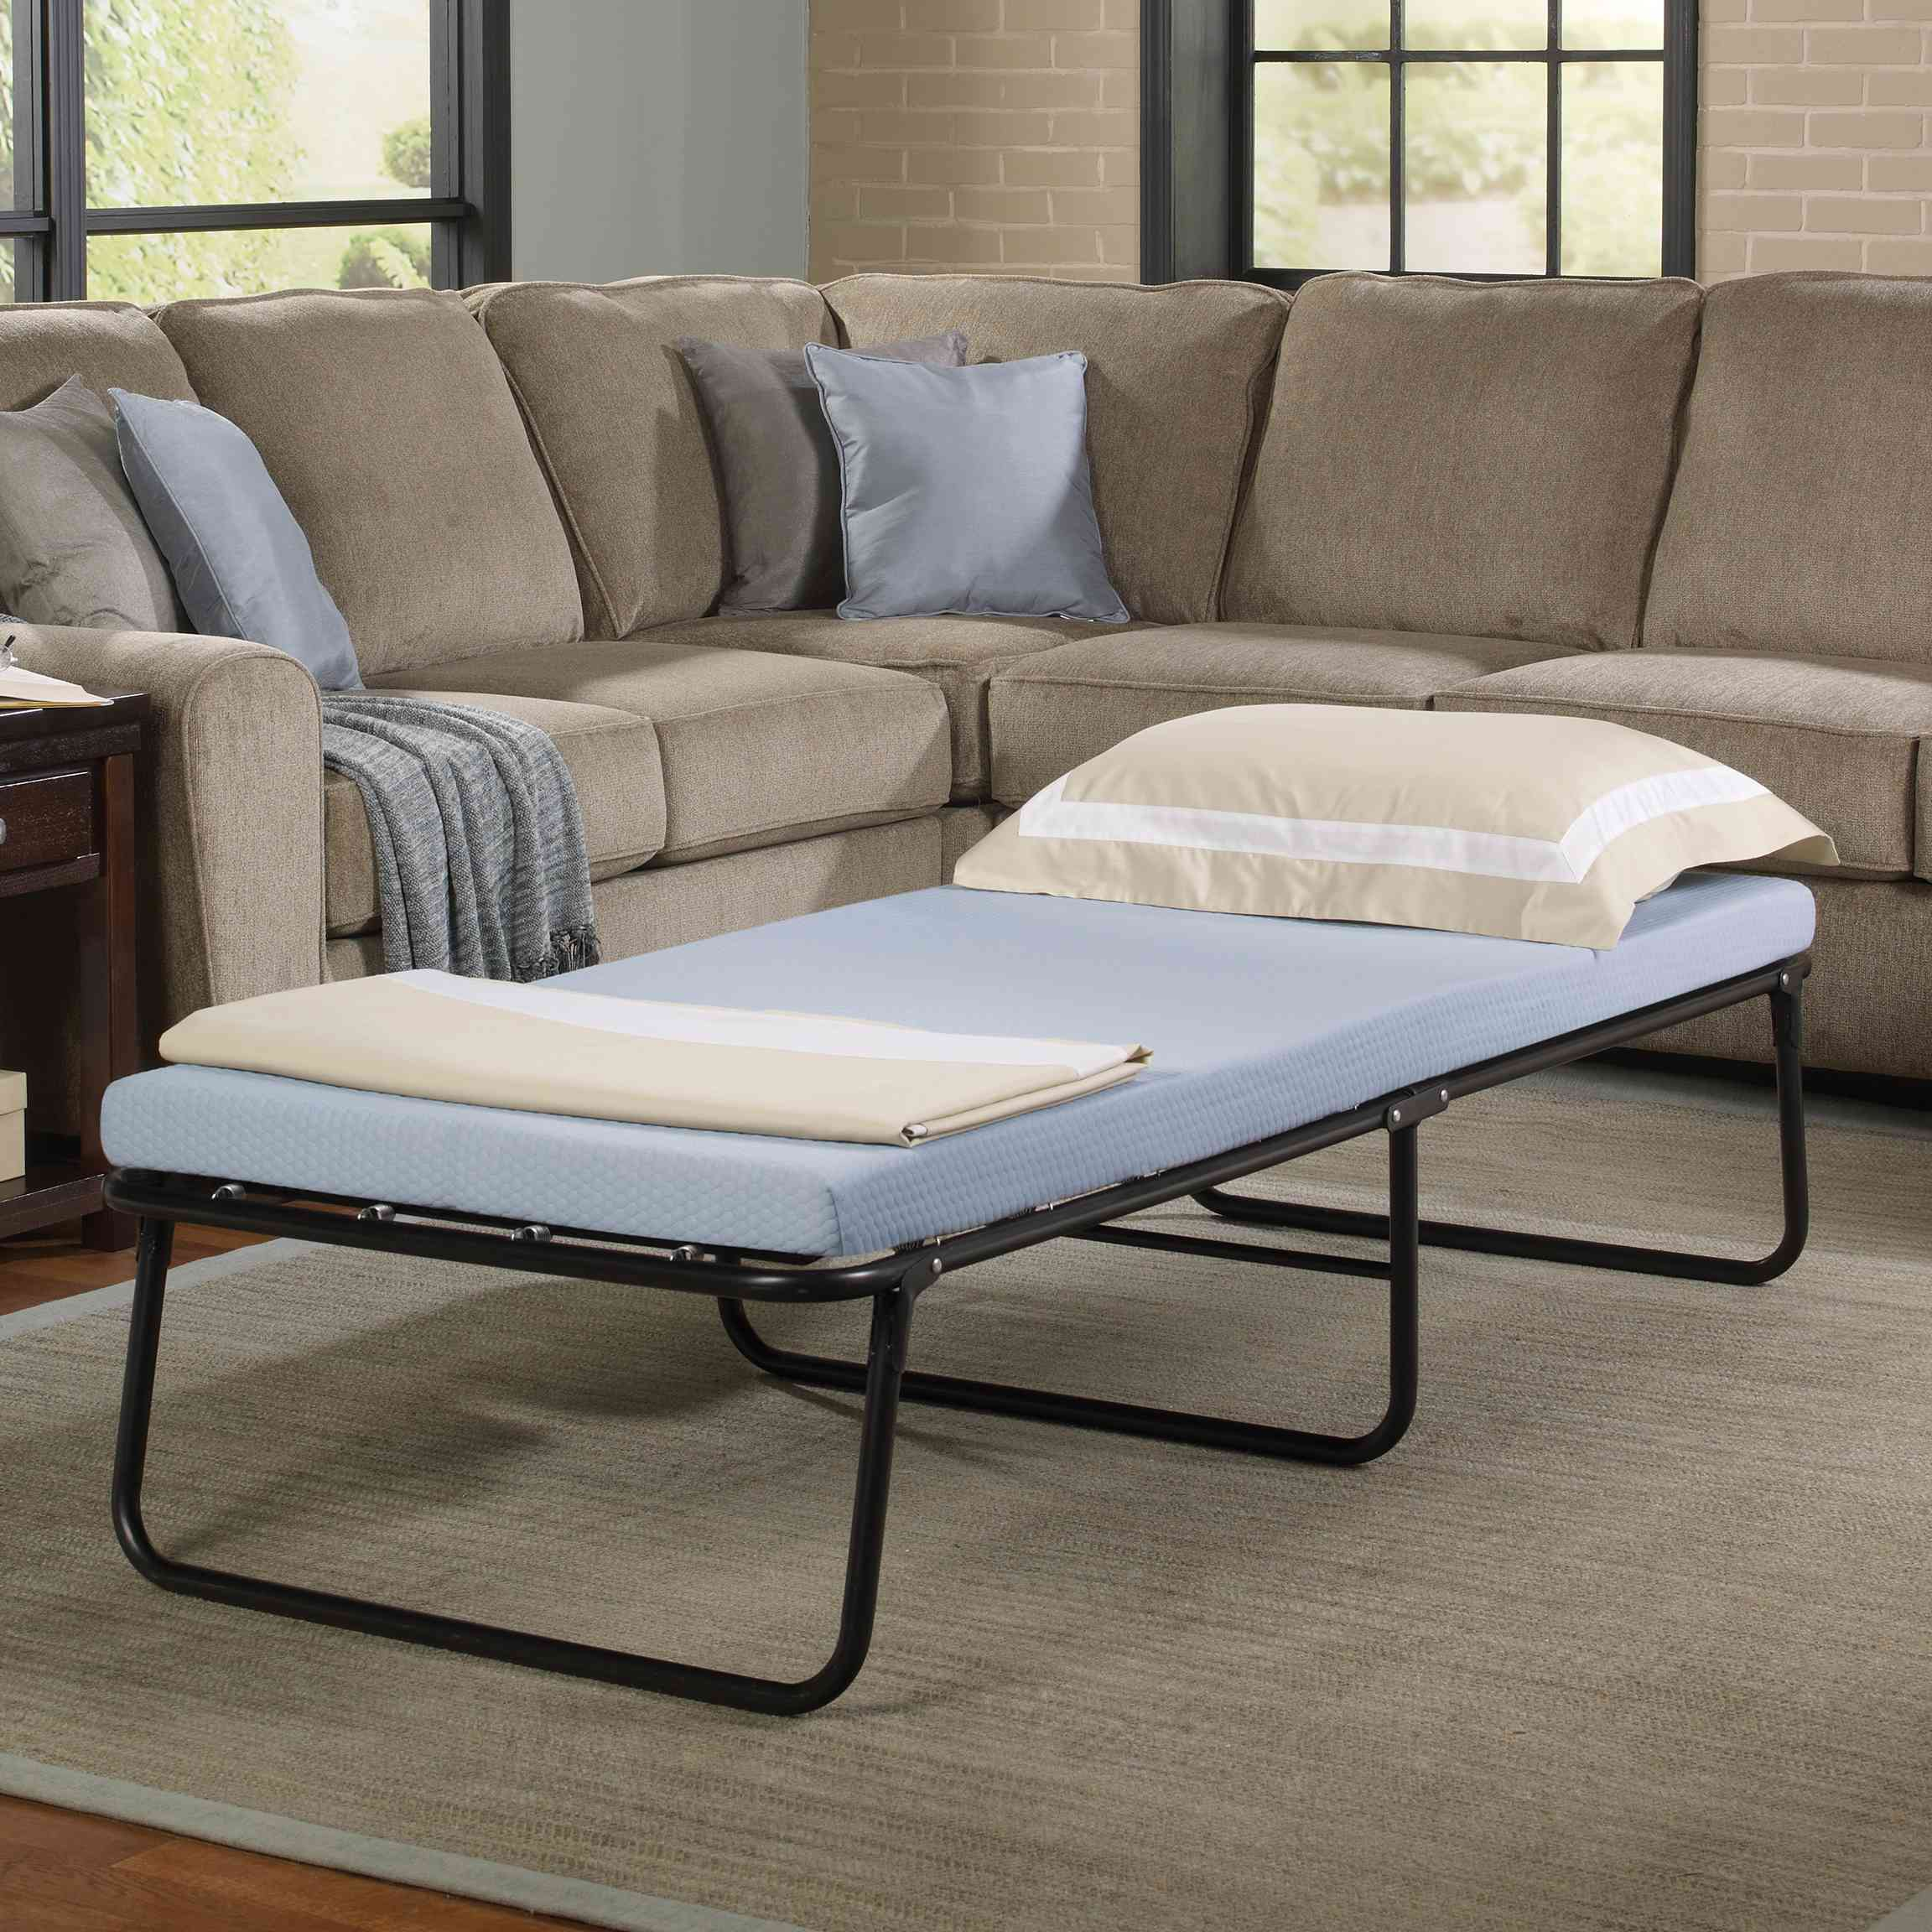 Simmons Beautysleep Folding Guest Bed with Memory Foam Mattress, Twin